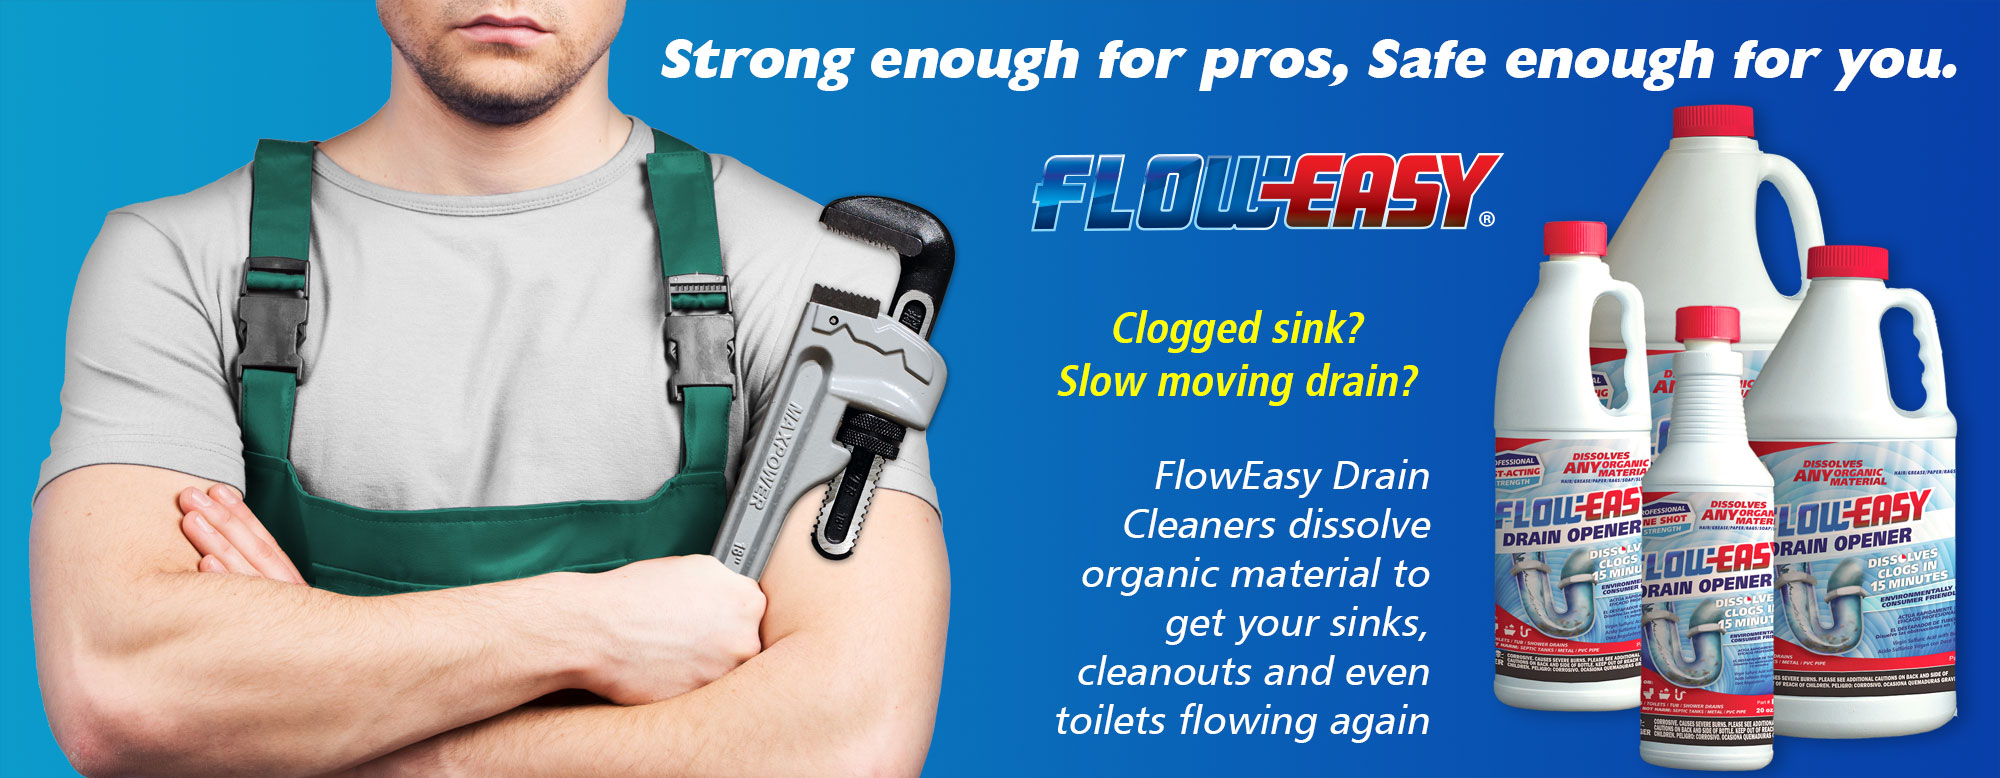 Flow-Easy Drain Opener